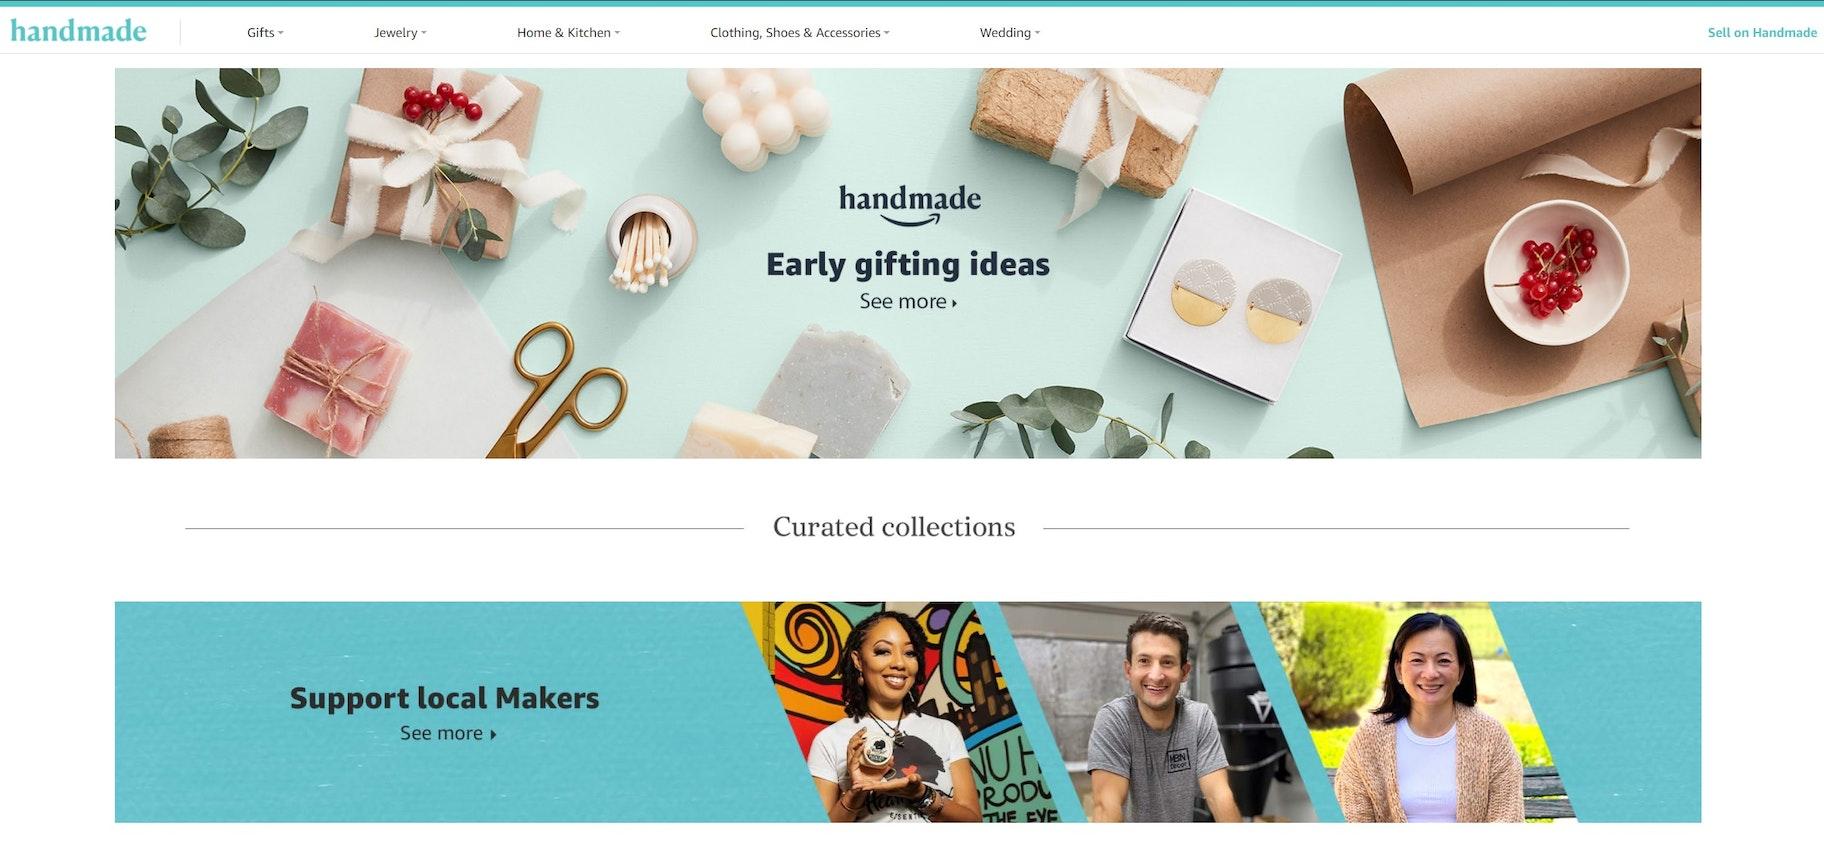 marketplace alternatives to Shopify: Amazon